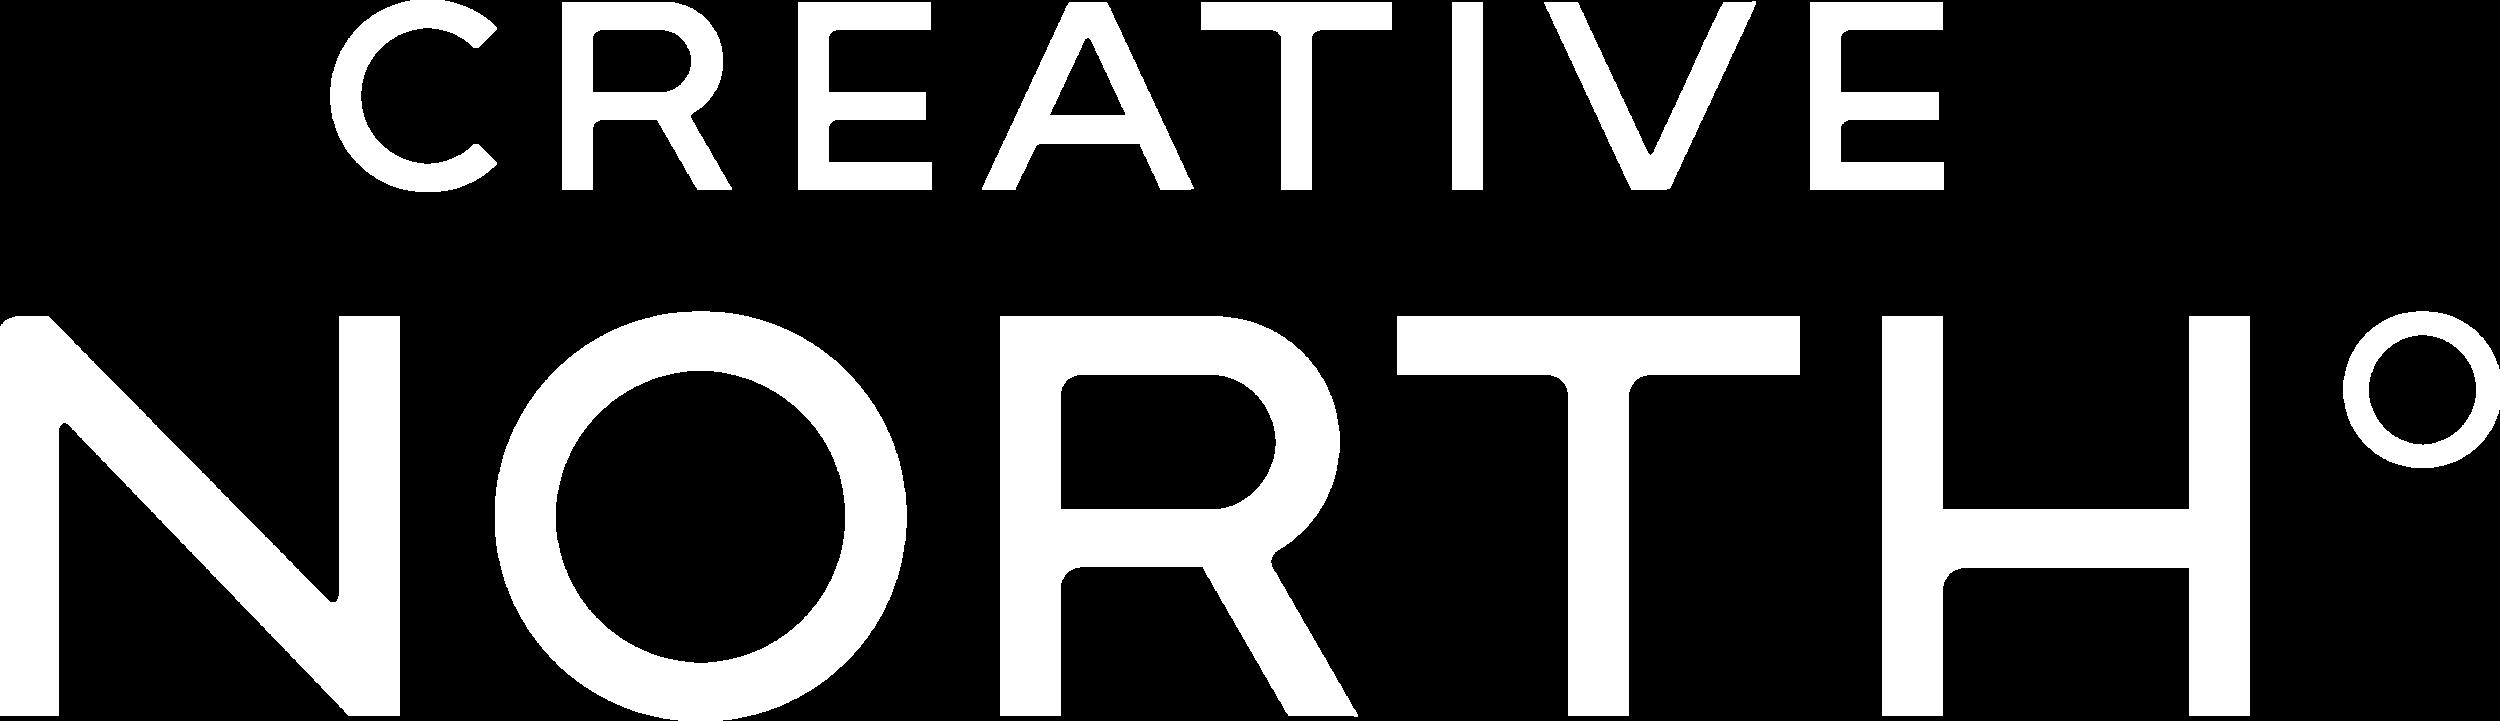 creative_north_N.png